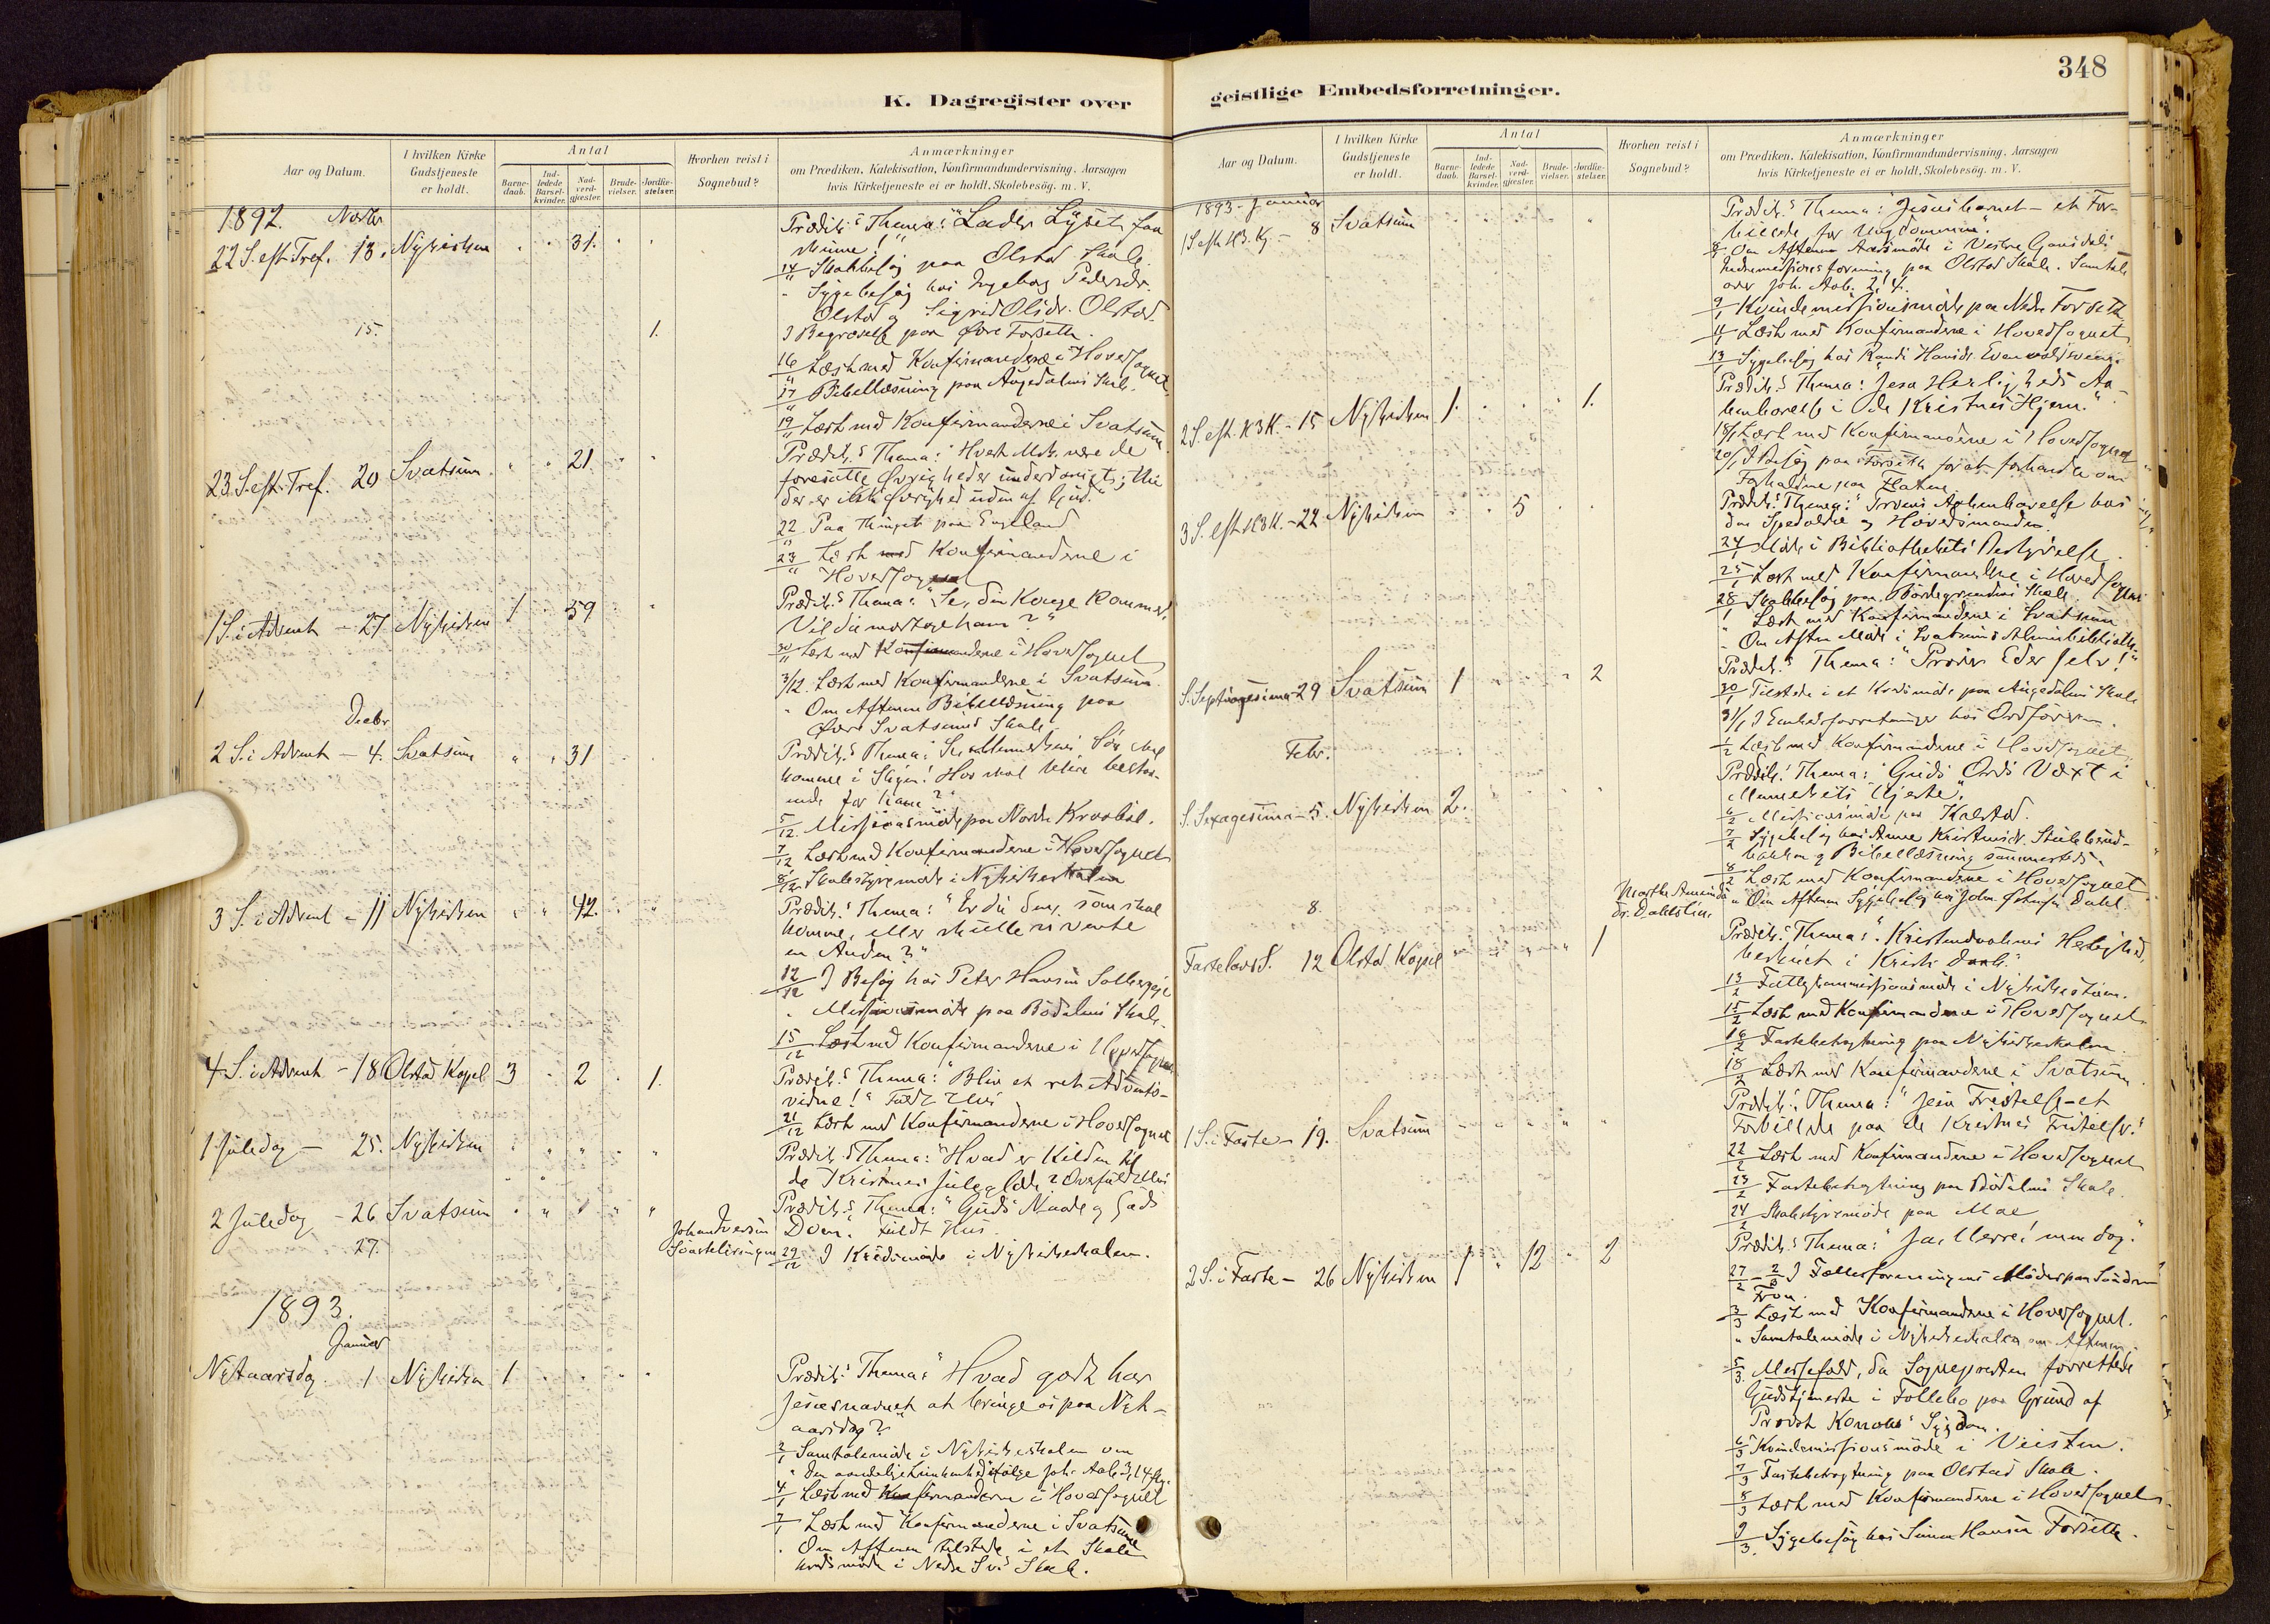 SAH, Vestre Gausdal prestekontor, Ministerialbok nr. 1, 1887-1914, s. 348